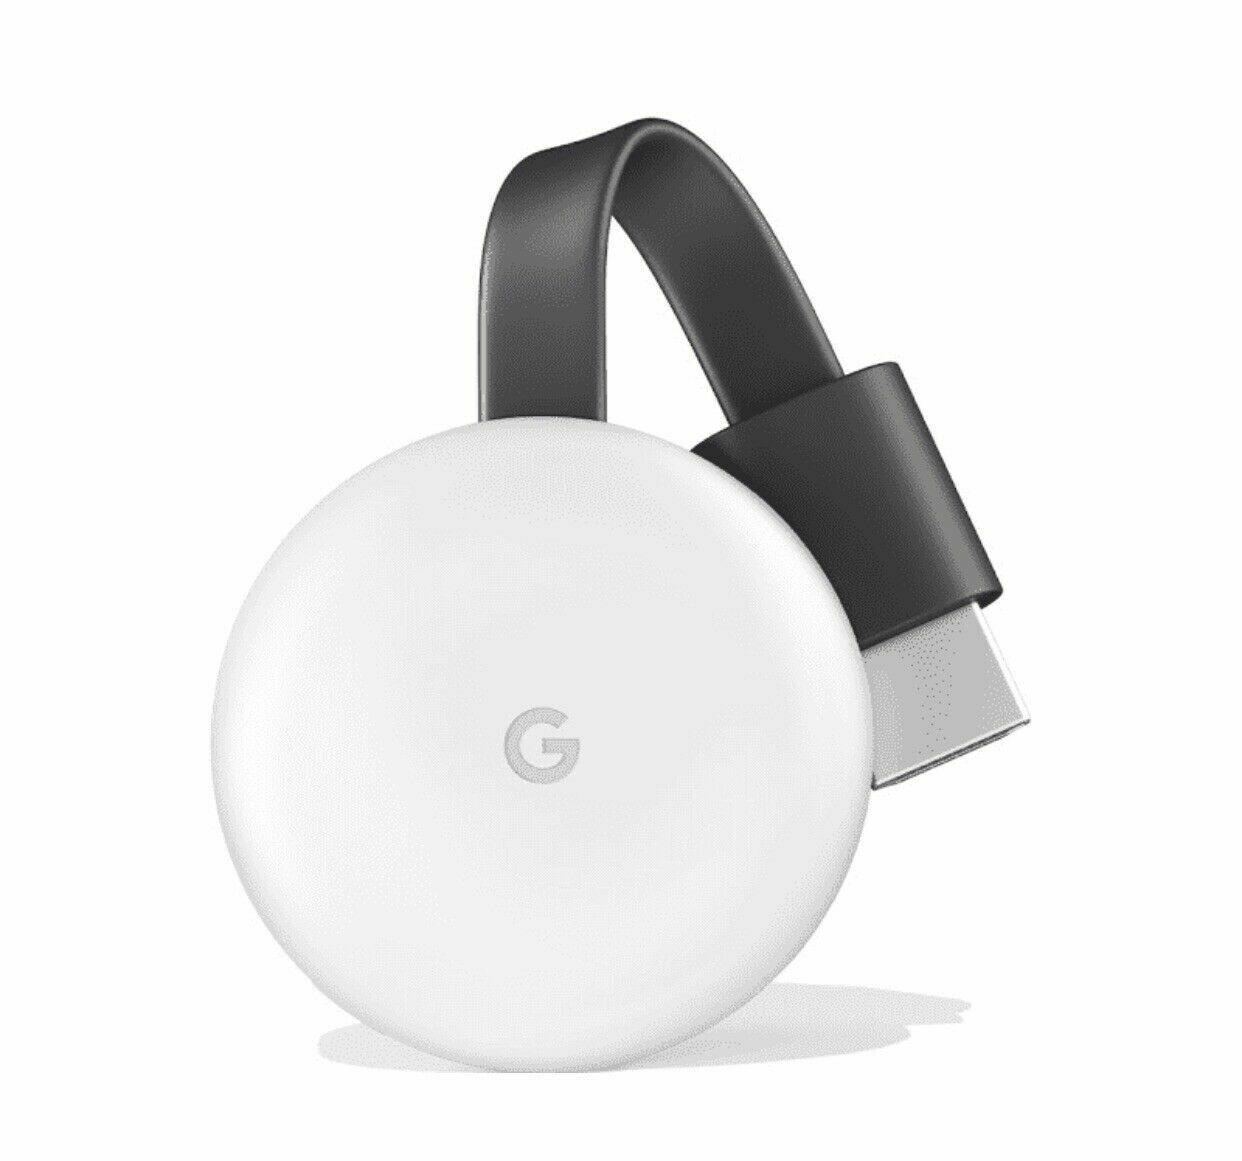 Google Chromecast 3rd Generation  (Latest Model) Streaming Media Player - Chalk Featured